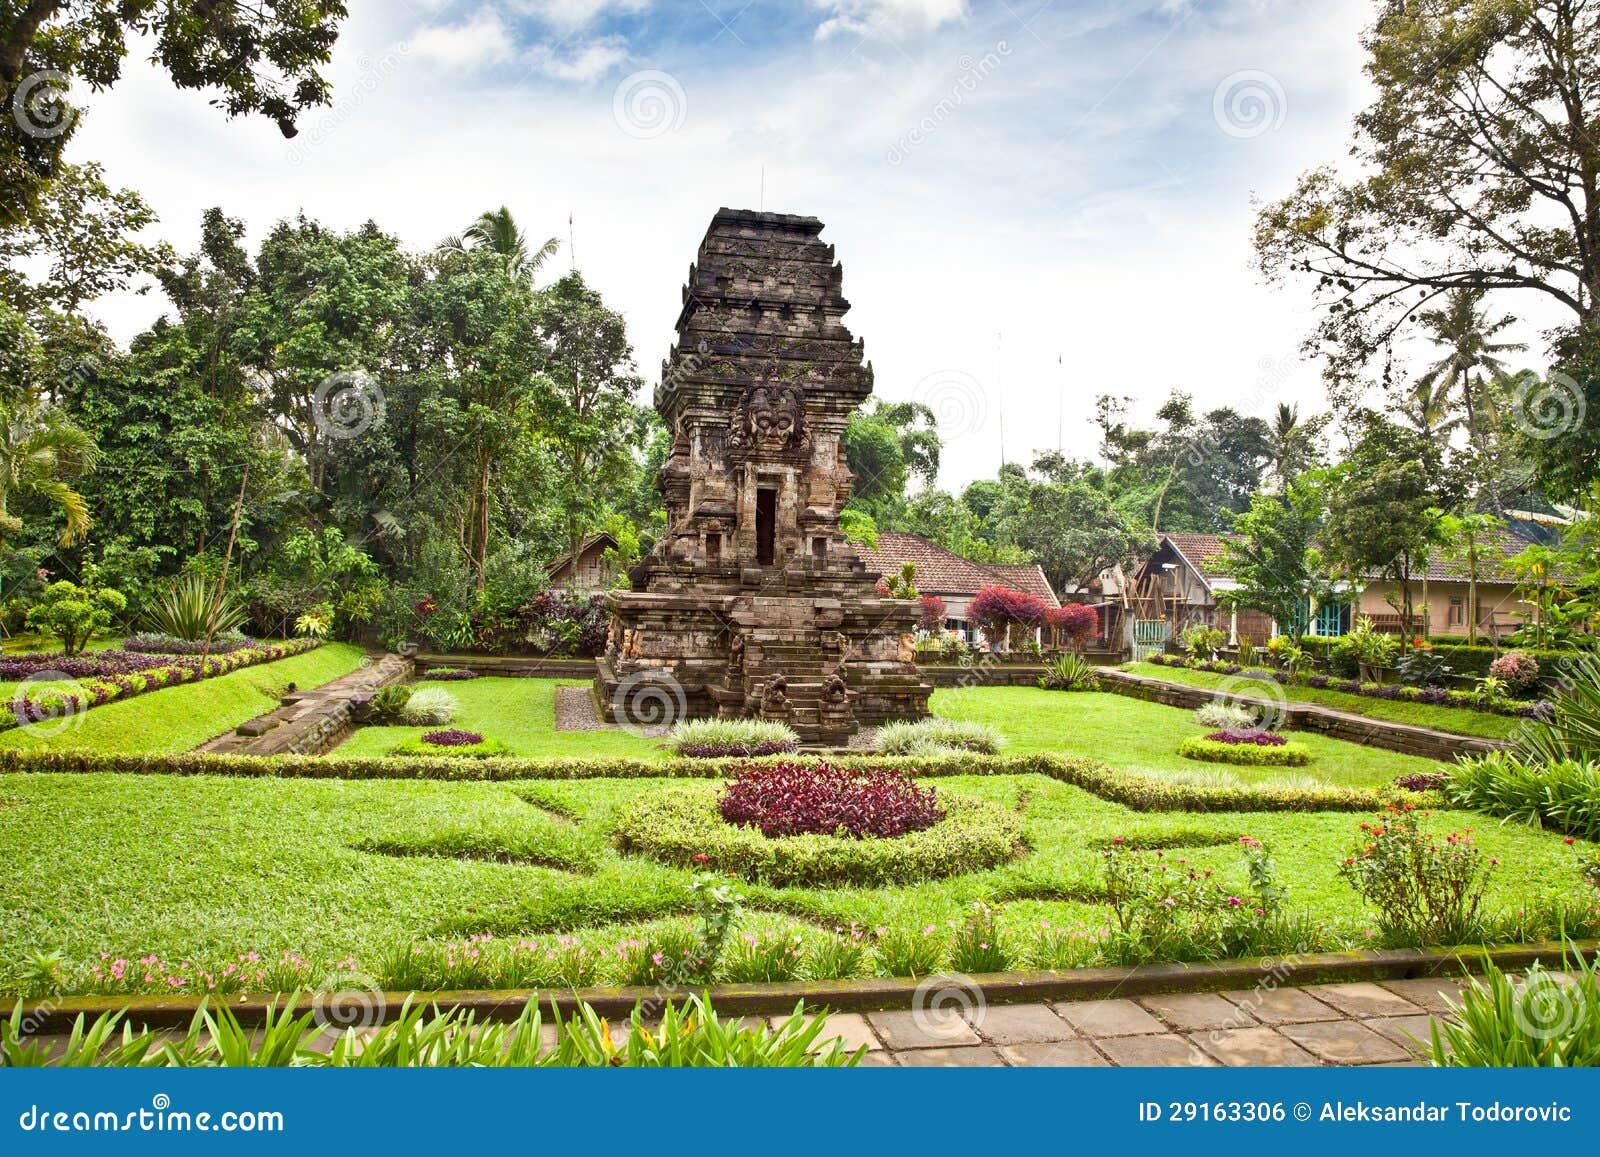 Image Result For Travel Malang Bali